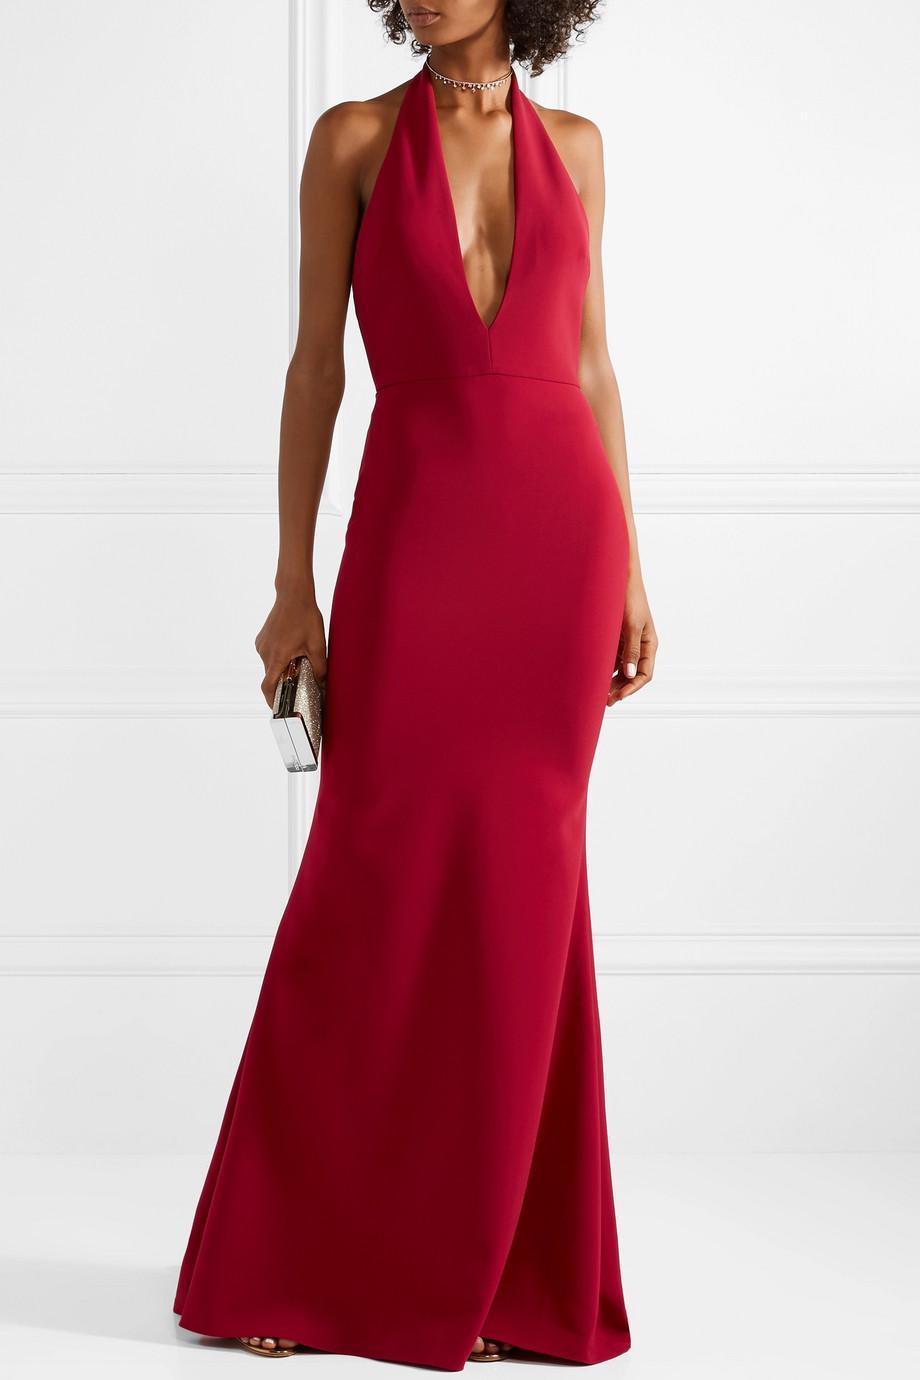 Lyst - Reem Acra Crepe Halterneck Gown in Red